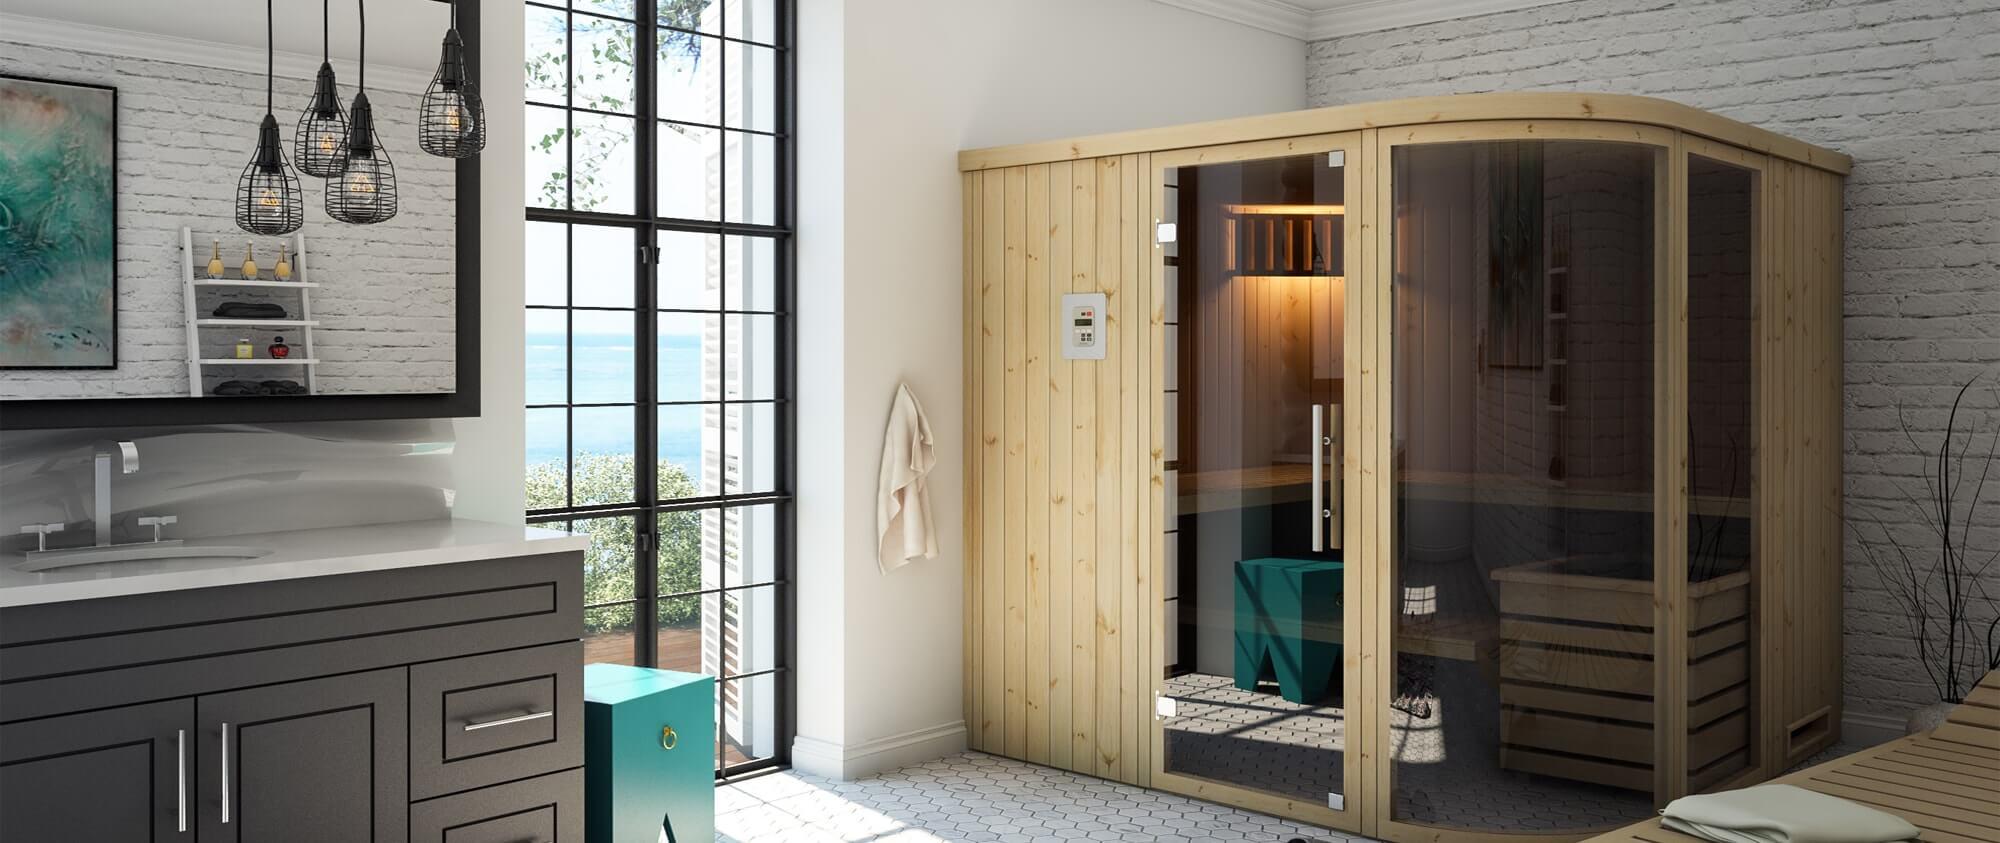 akcesoria do sauny